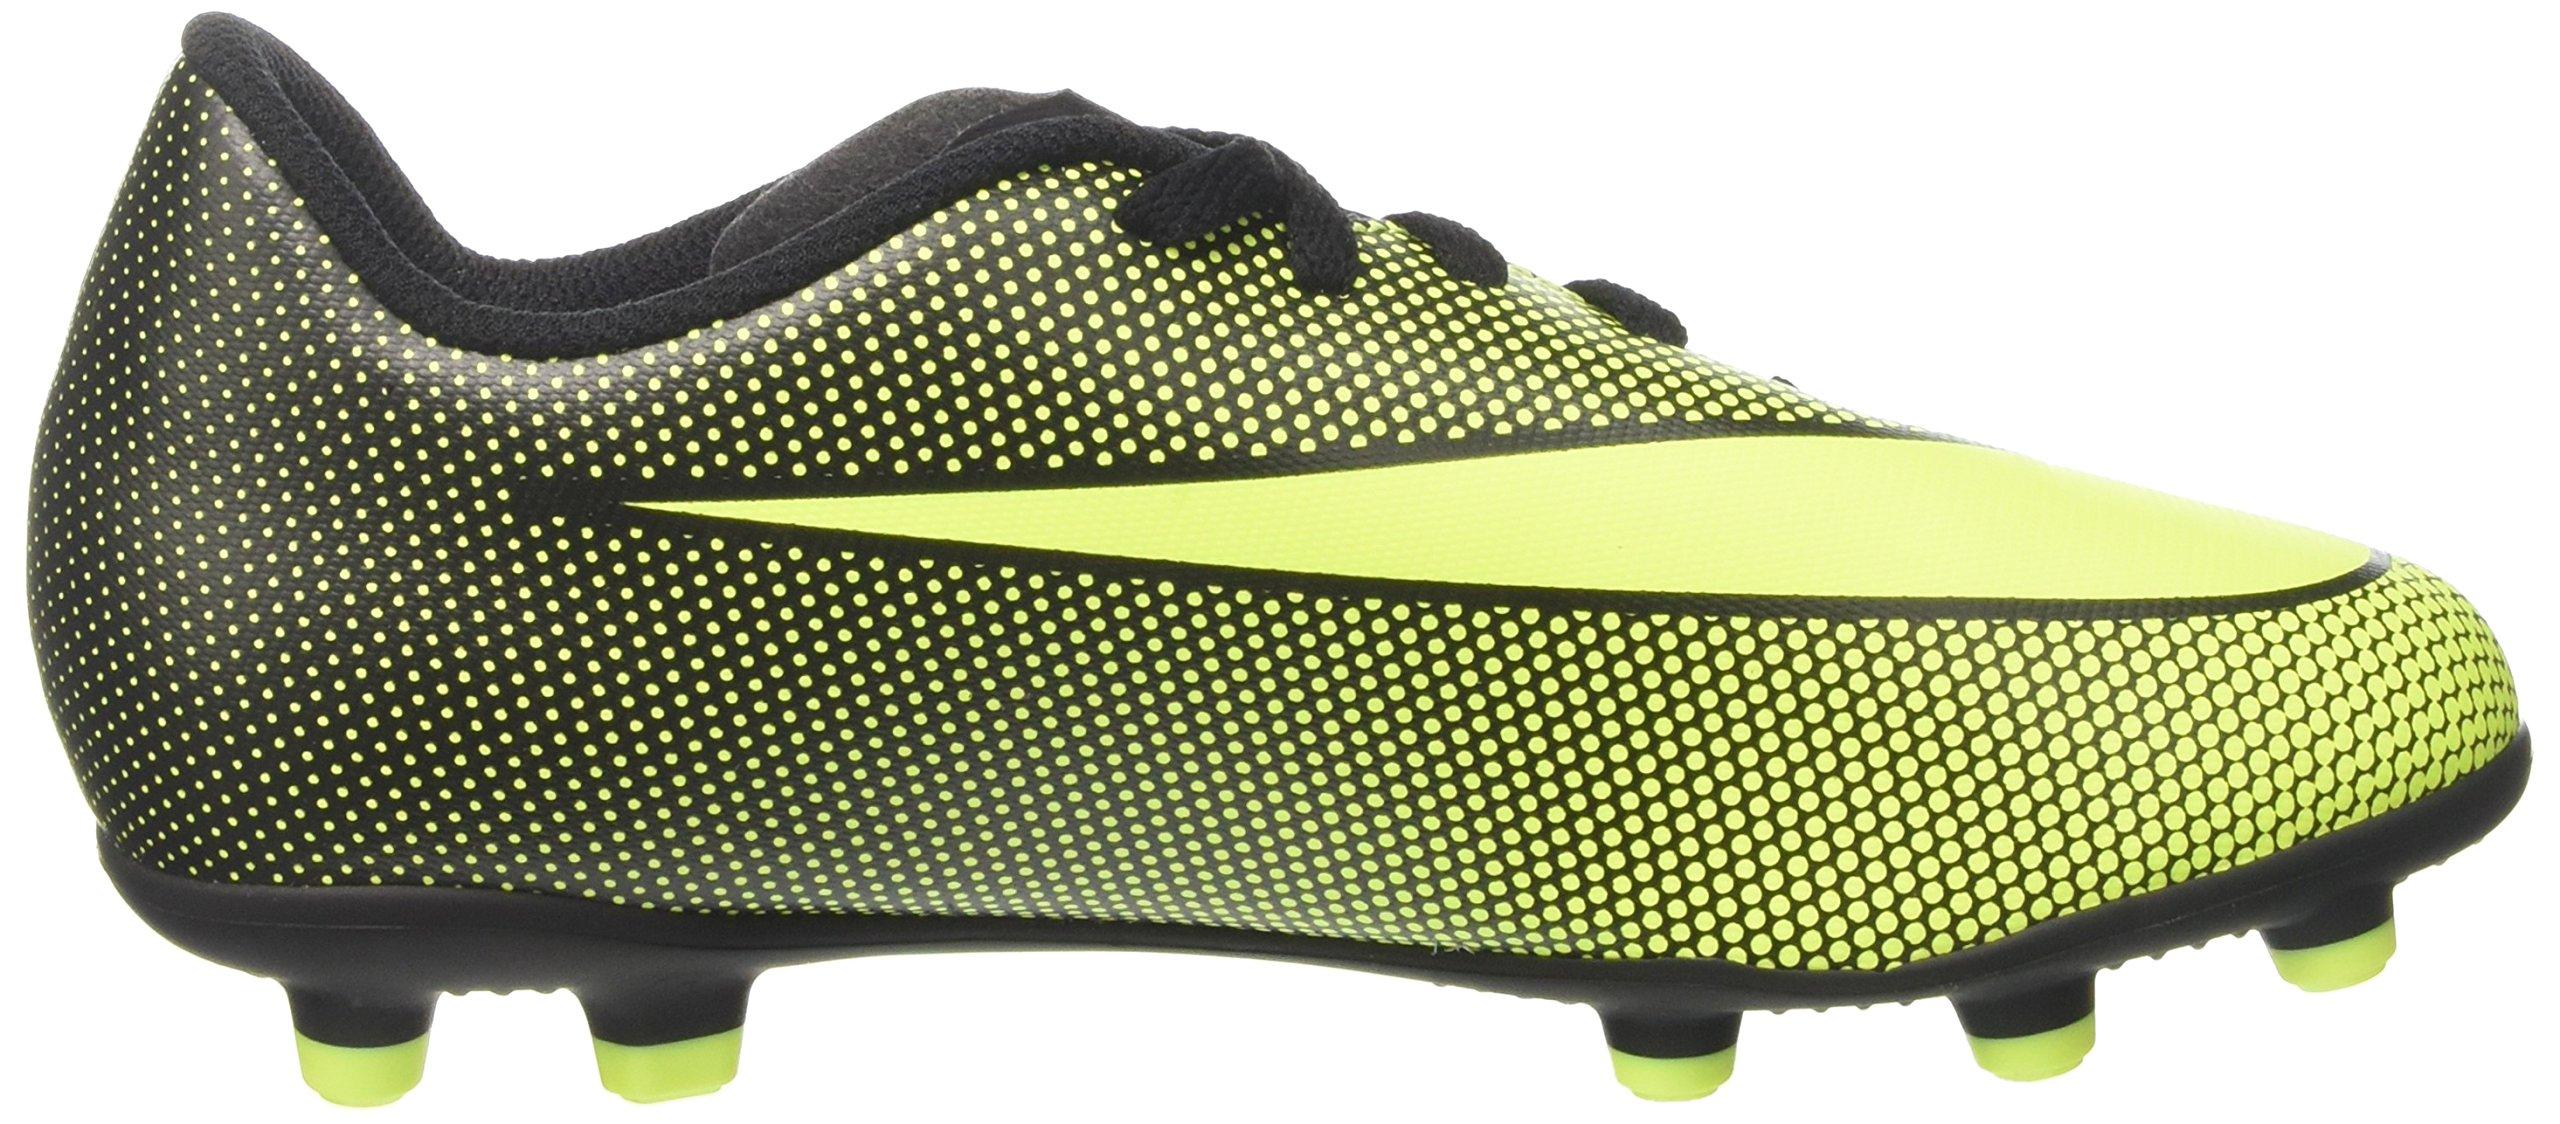 size 40 0291c a8bc5 NIKE Kids Jr Bravata II FG Soccer Cleat